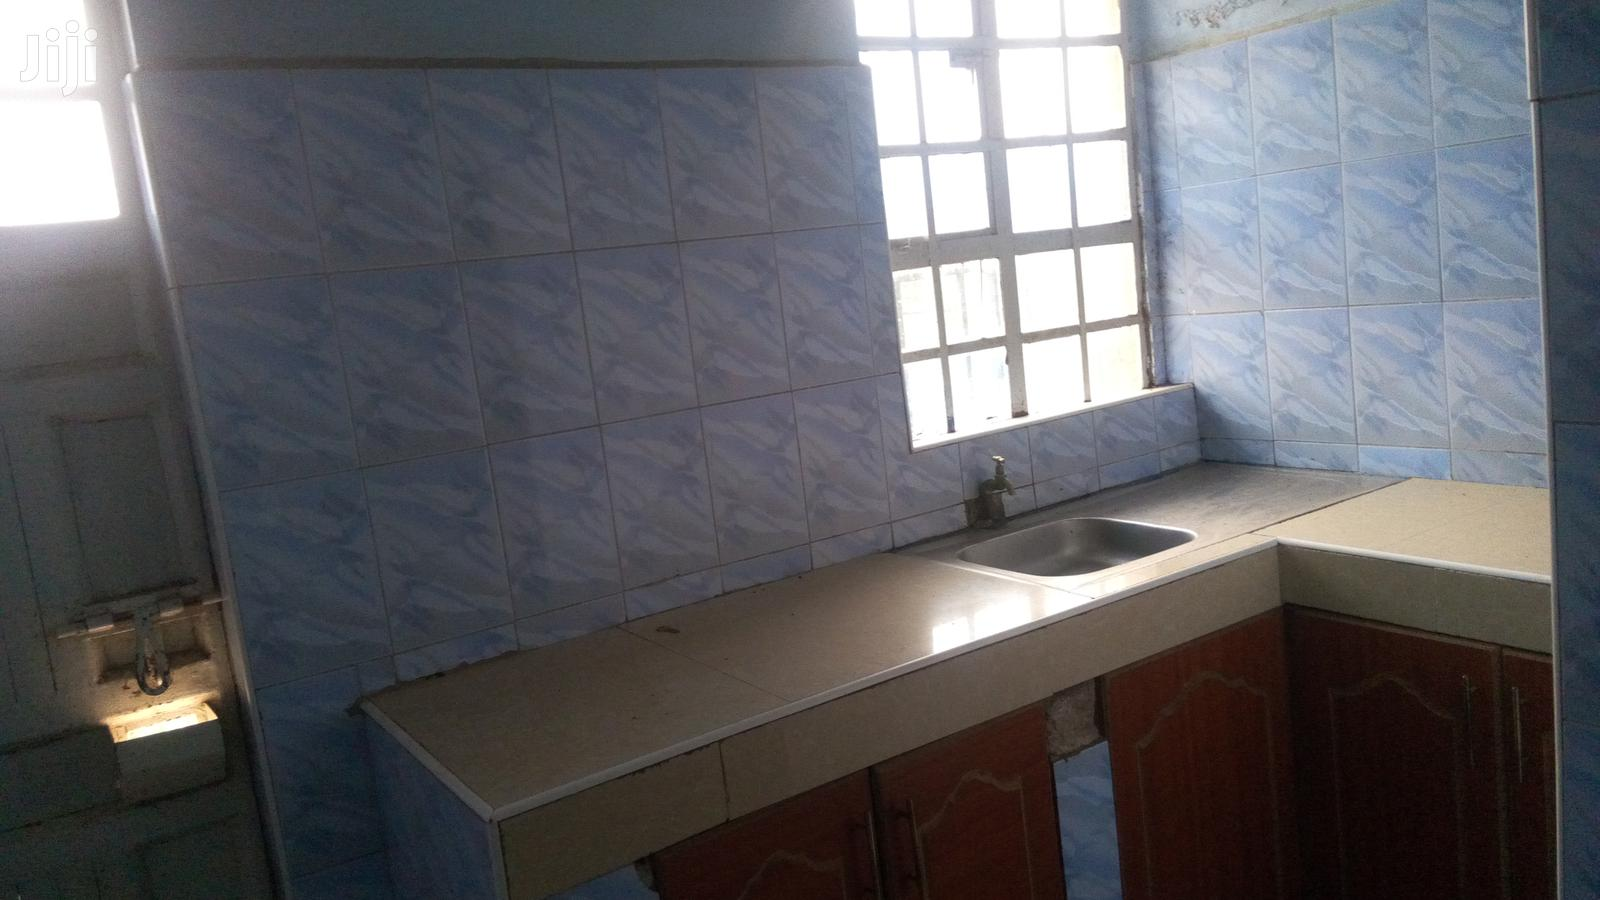 1 Bedroom Lolwe | Houses & Apartments For Rent for sale in Migosi, Kisumu, Kenya